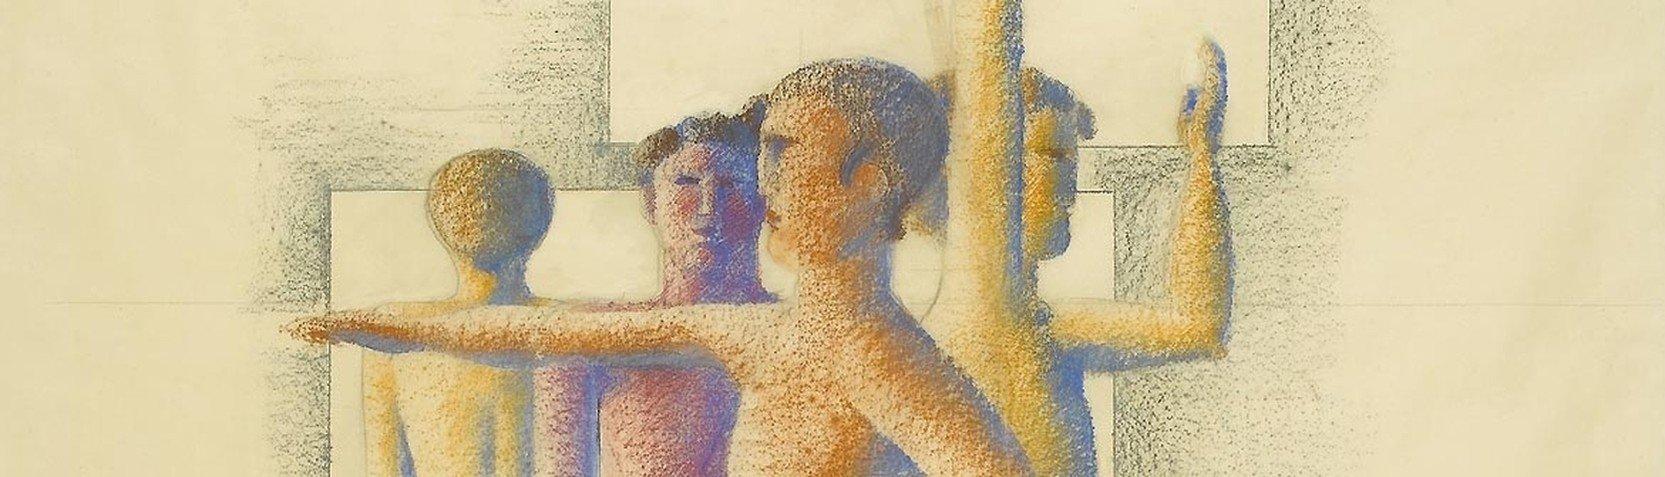 Artistes - Oskar Schlemmer